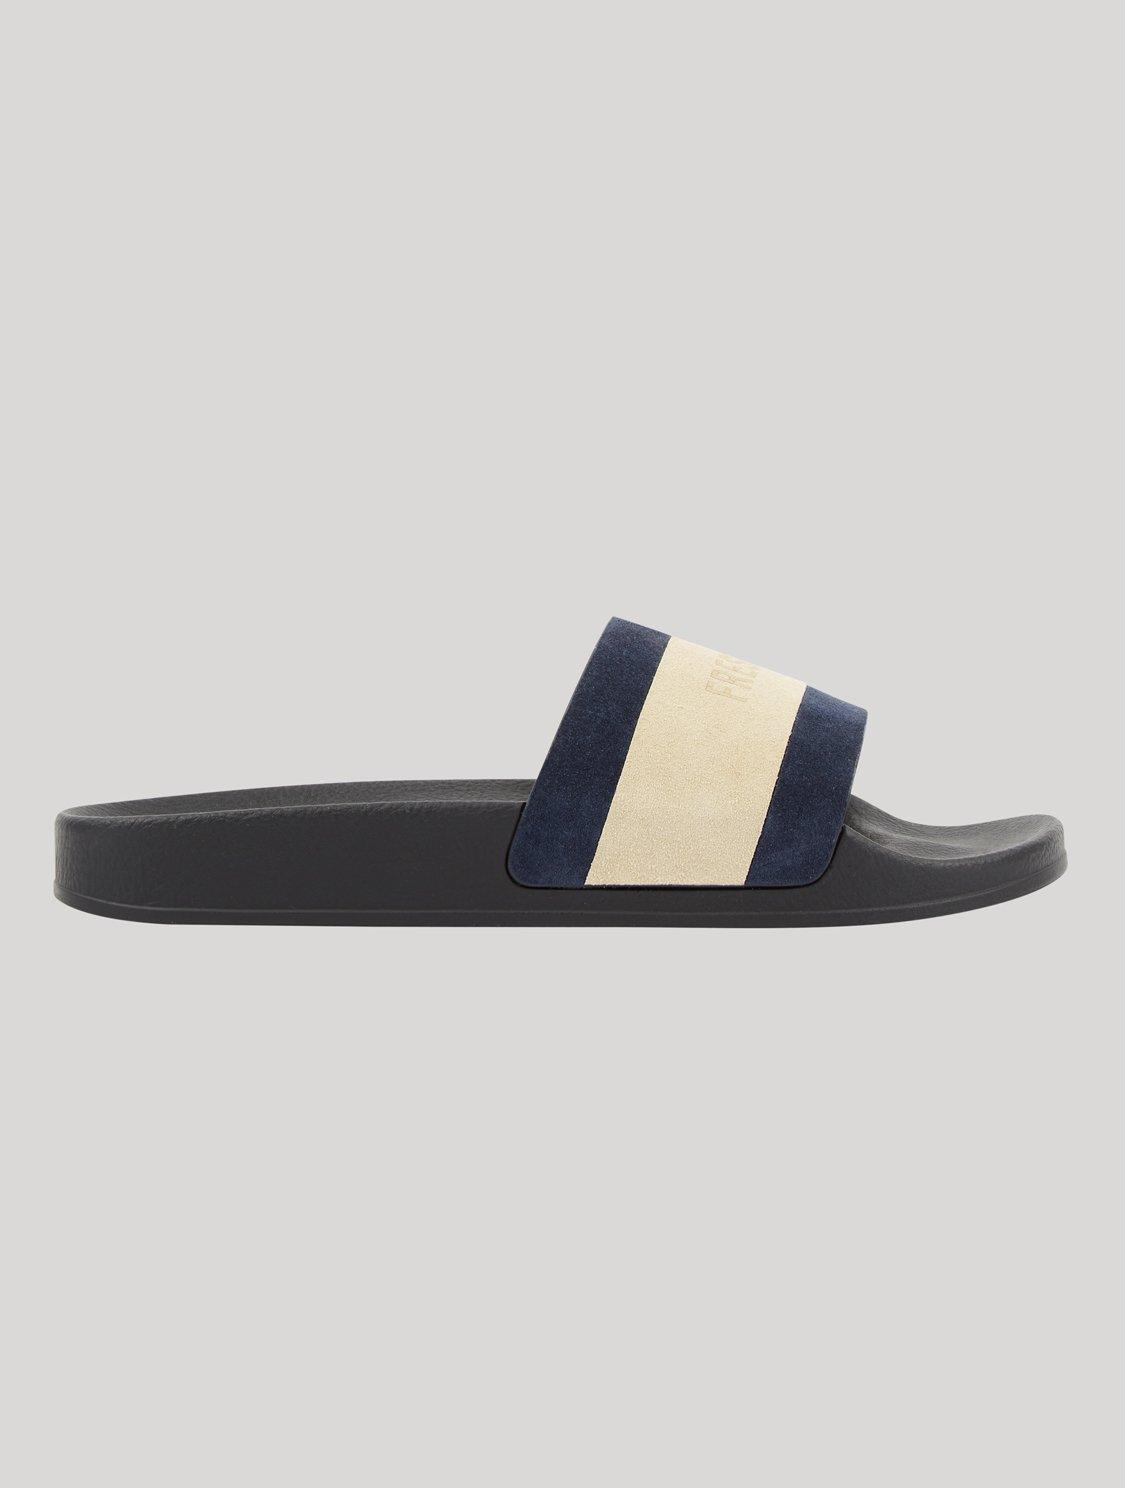 Humberto Sliders Frescobol Stripe Navy & Off-White 43